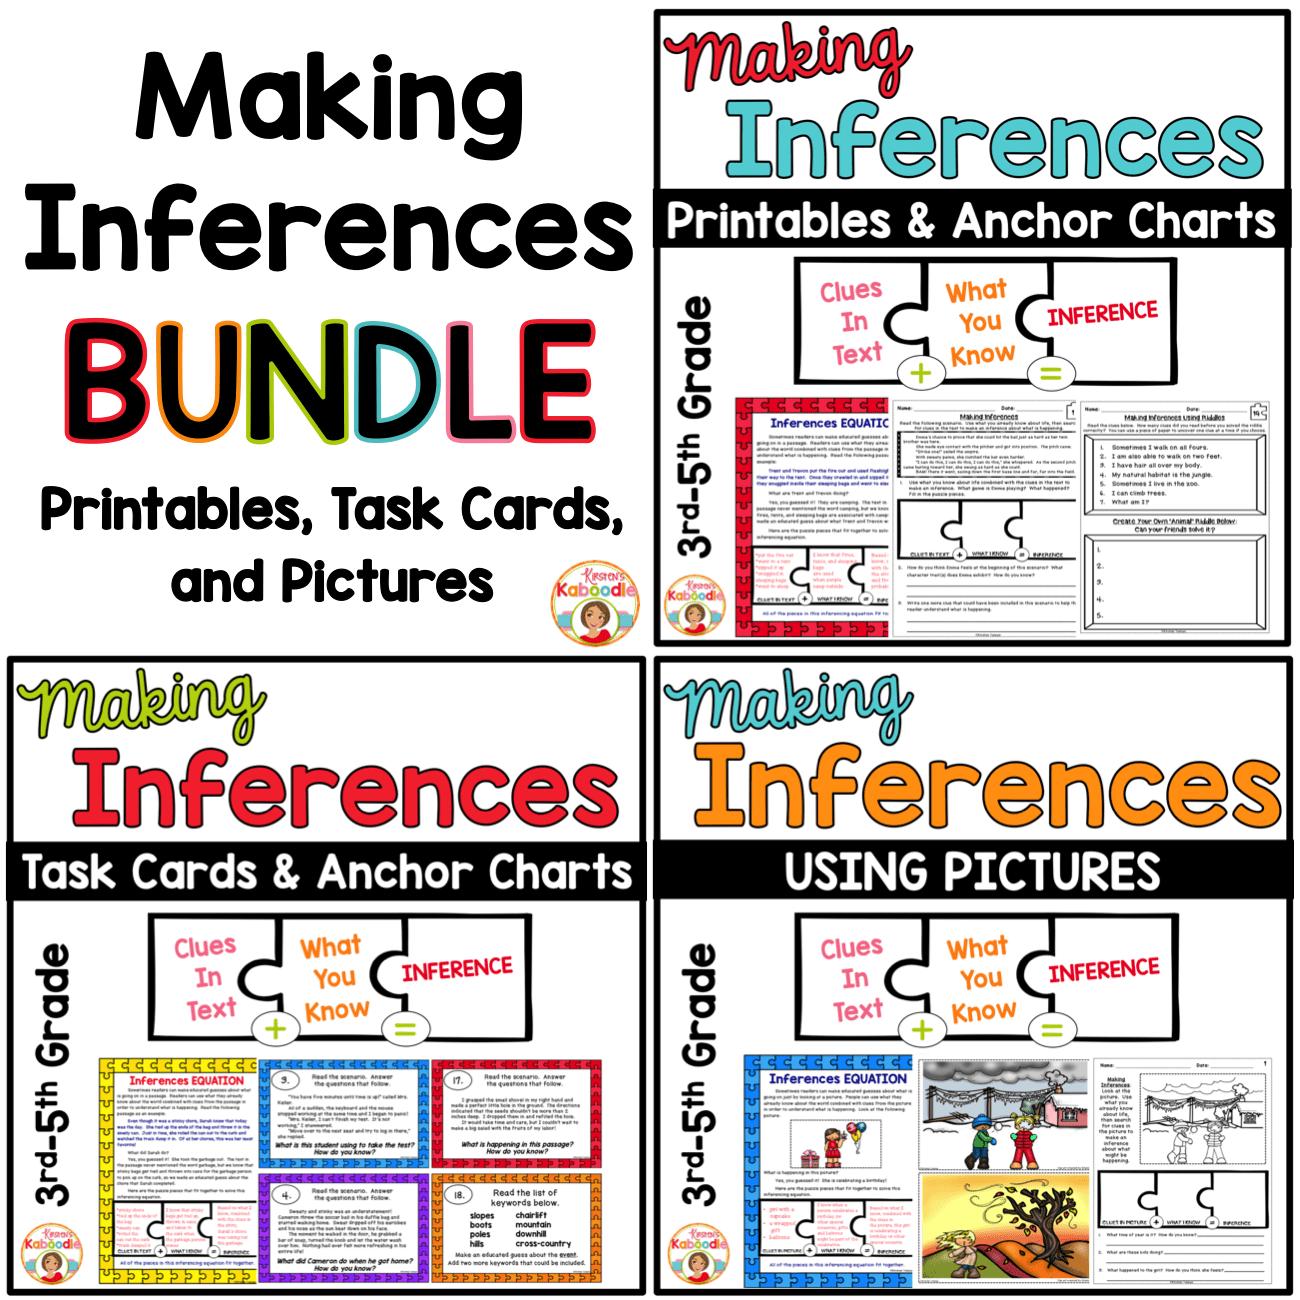 hight resolution of Making Inferences Worksheet 6th Grade - Worksheet List